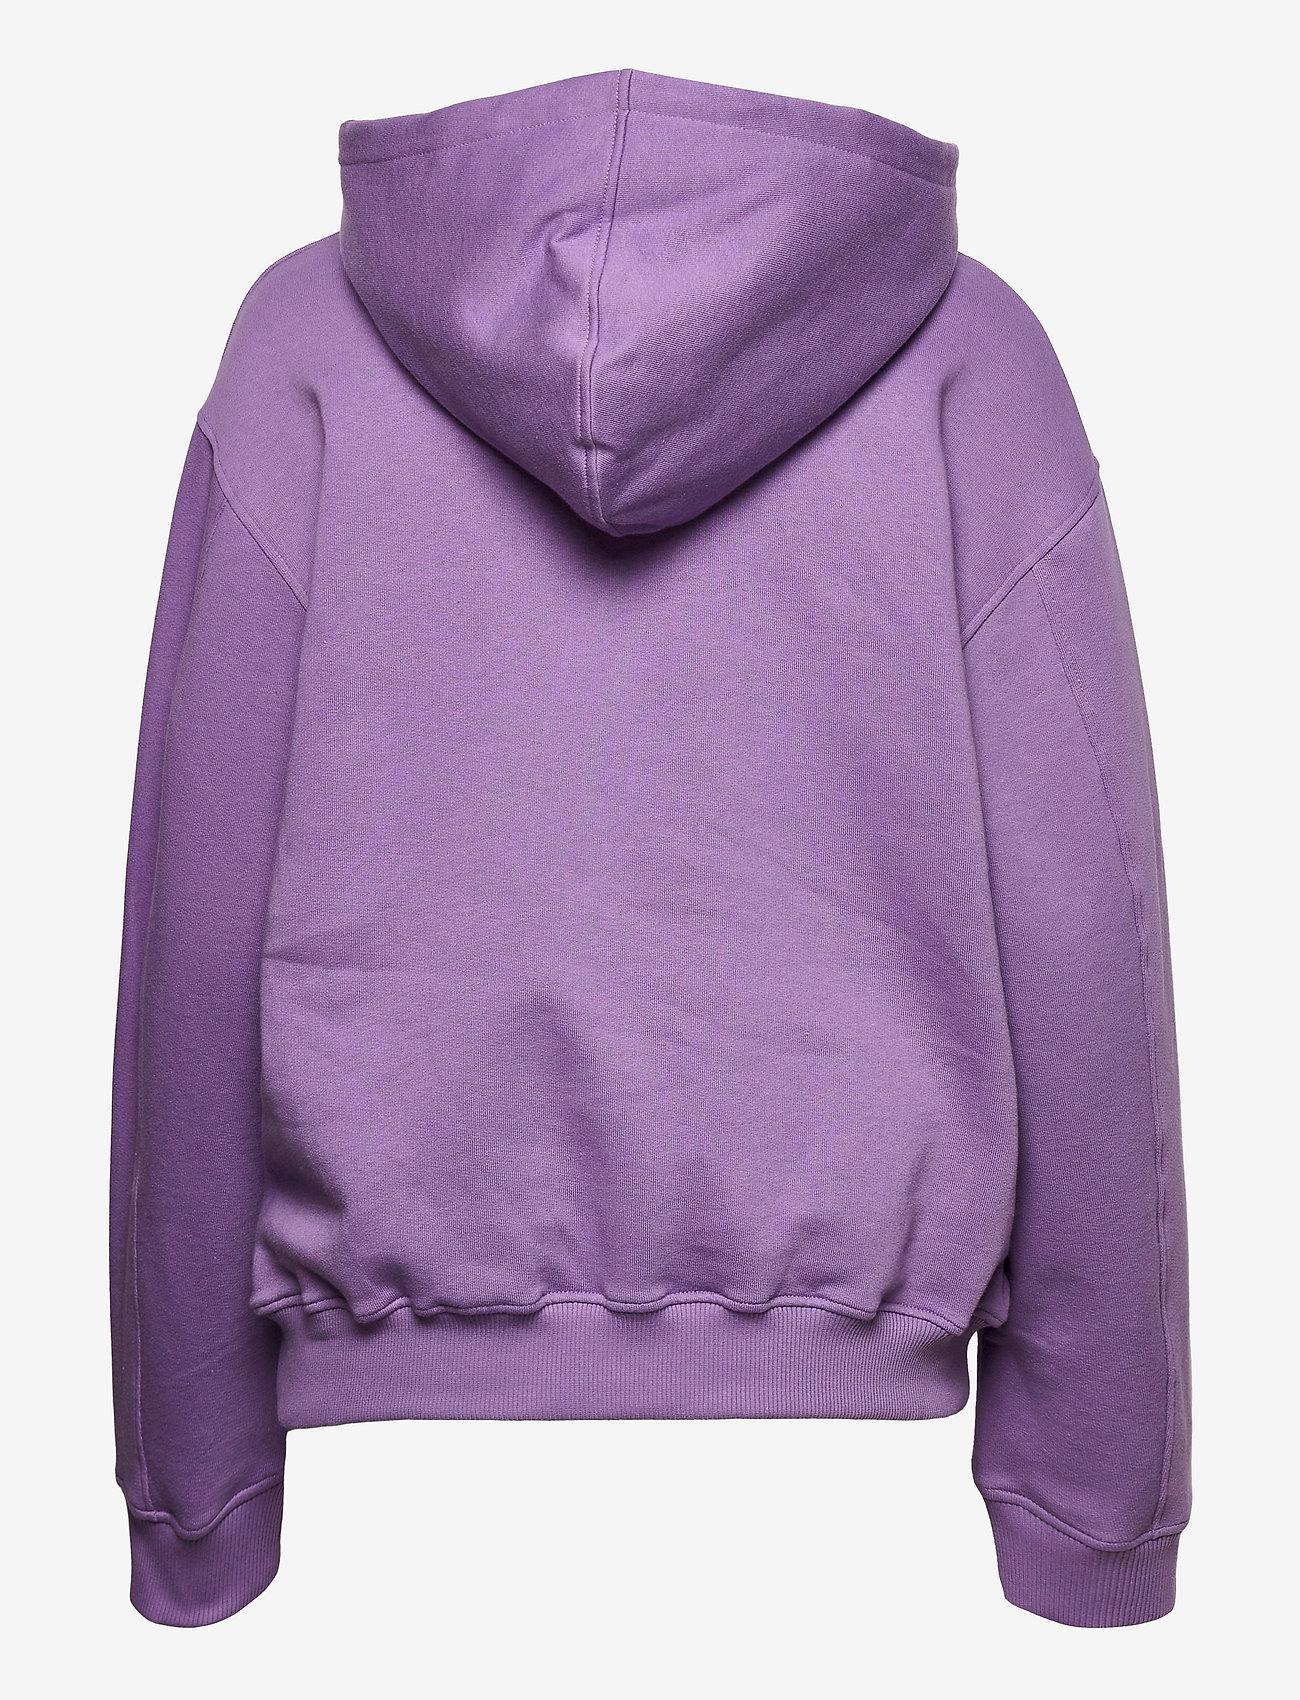 STINE GOYA - Adrisa, 1209 Tracksuit Goya - sweatshirts en hoodies - lilac - 1